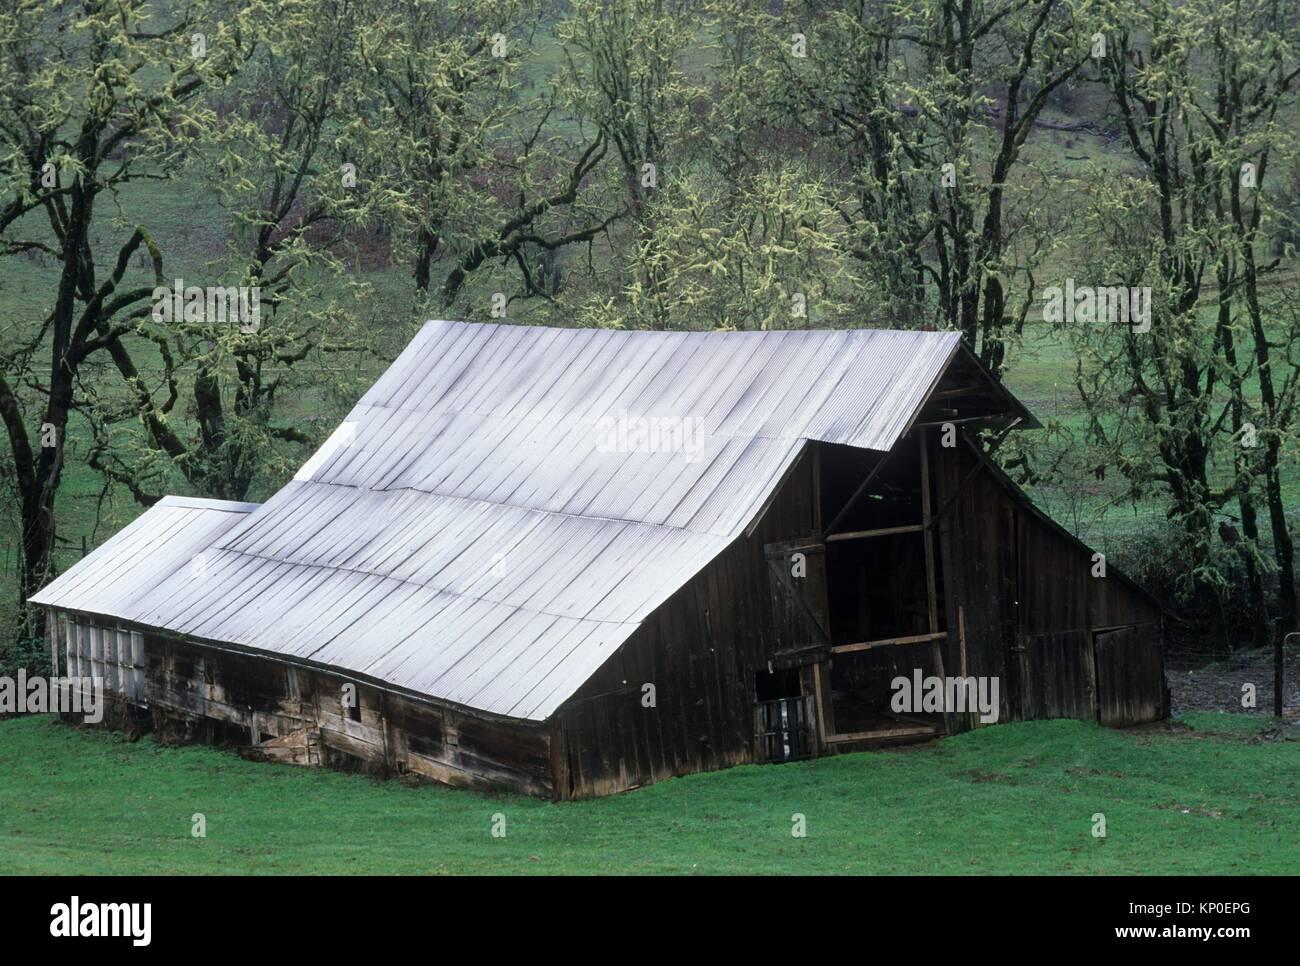 Barn, Mildred Kanipe County Park, Douglas County, Oregon. - Stock Image